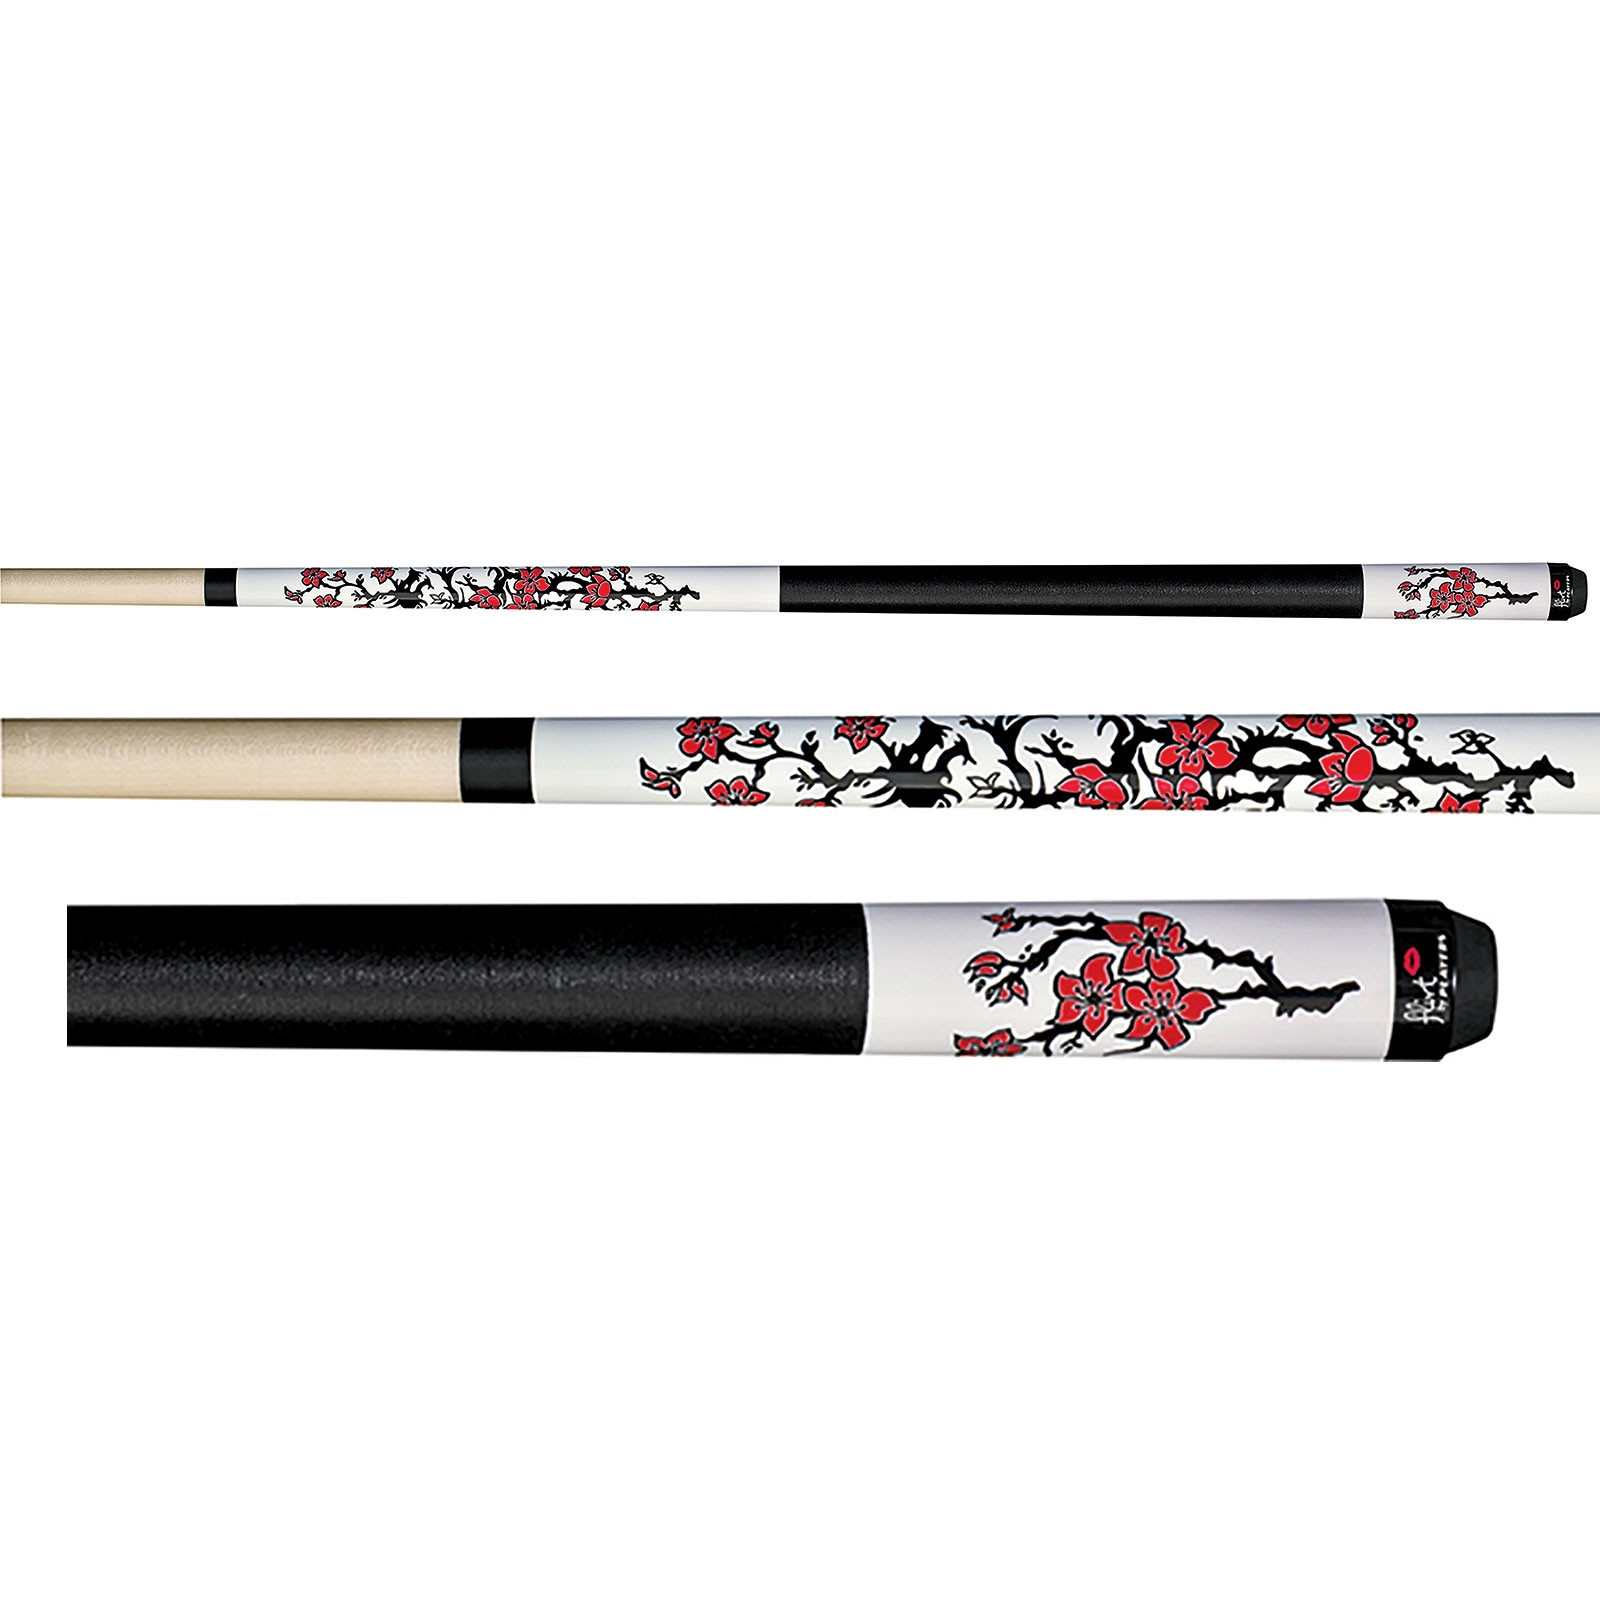 Players F-2630 Flirt Dragon Blossoms Pool Cue Stick